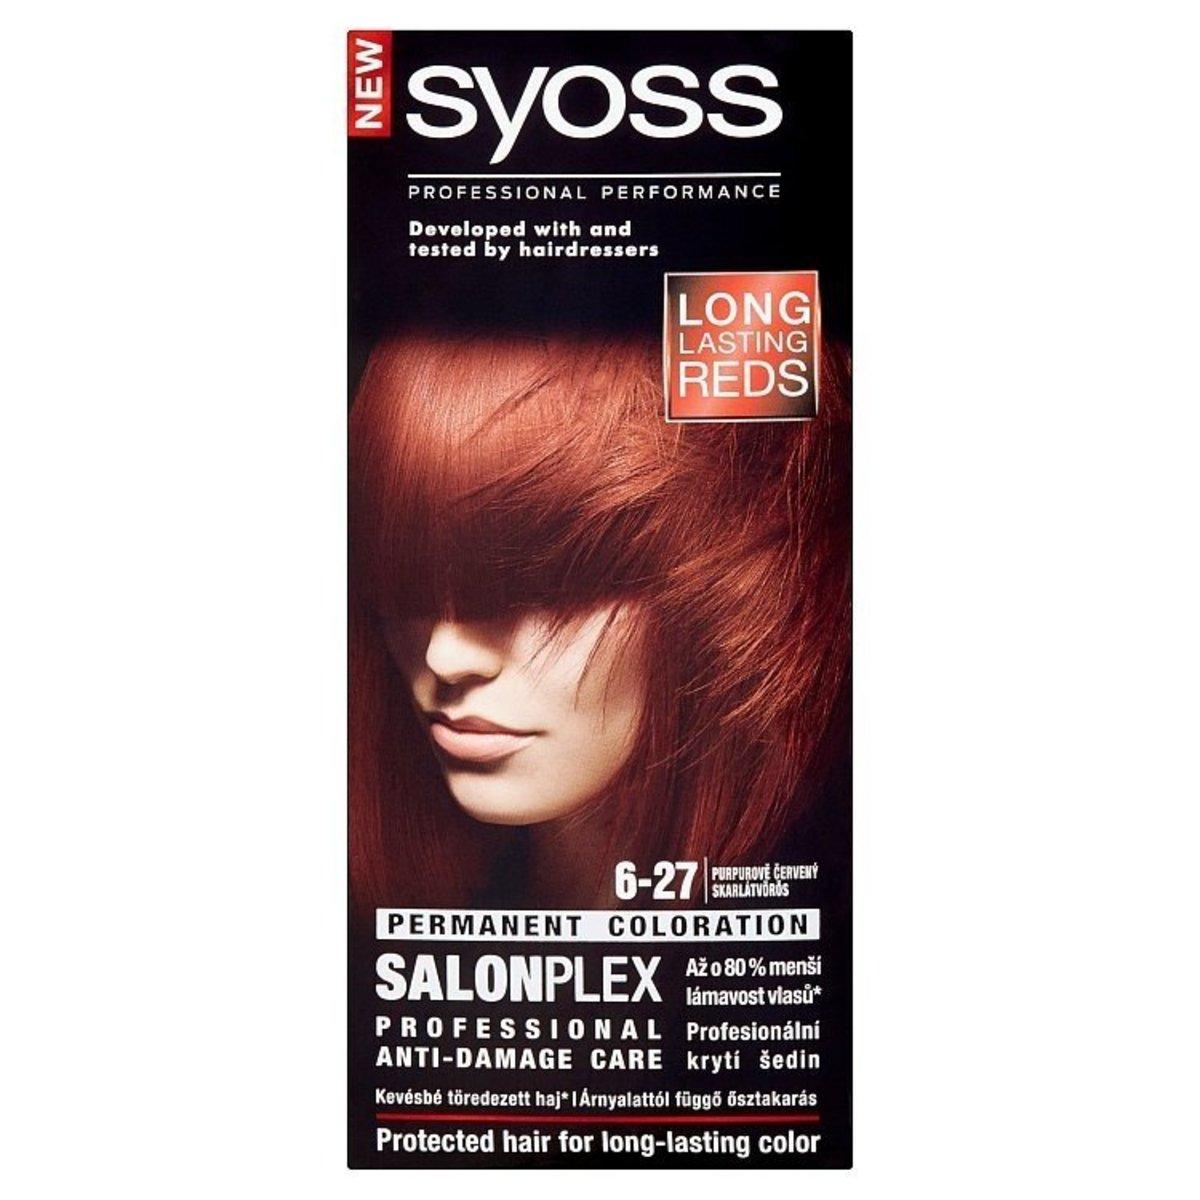 Salonplex Professional Anti-Damage Care Hair Color 6-27 Scarlett [Parallel Import Product]